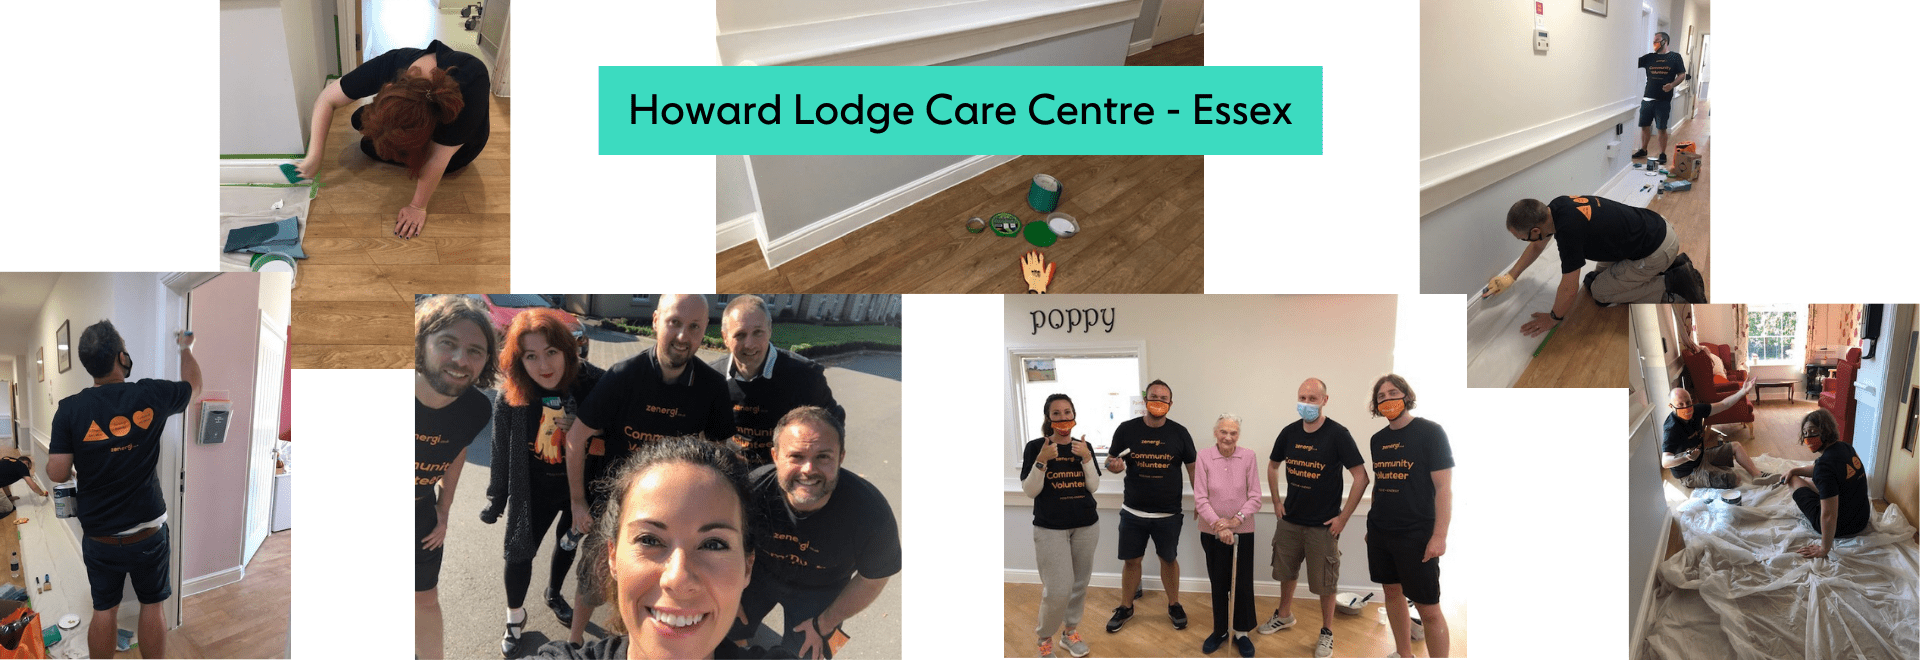 Howard Lodge Care Home